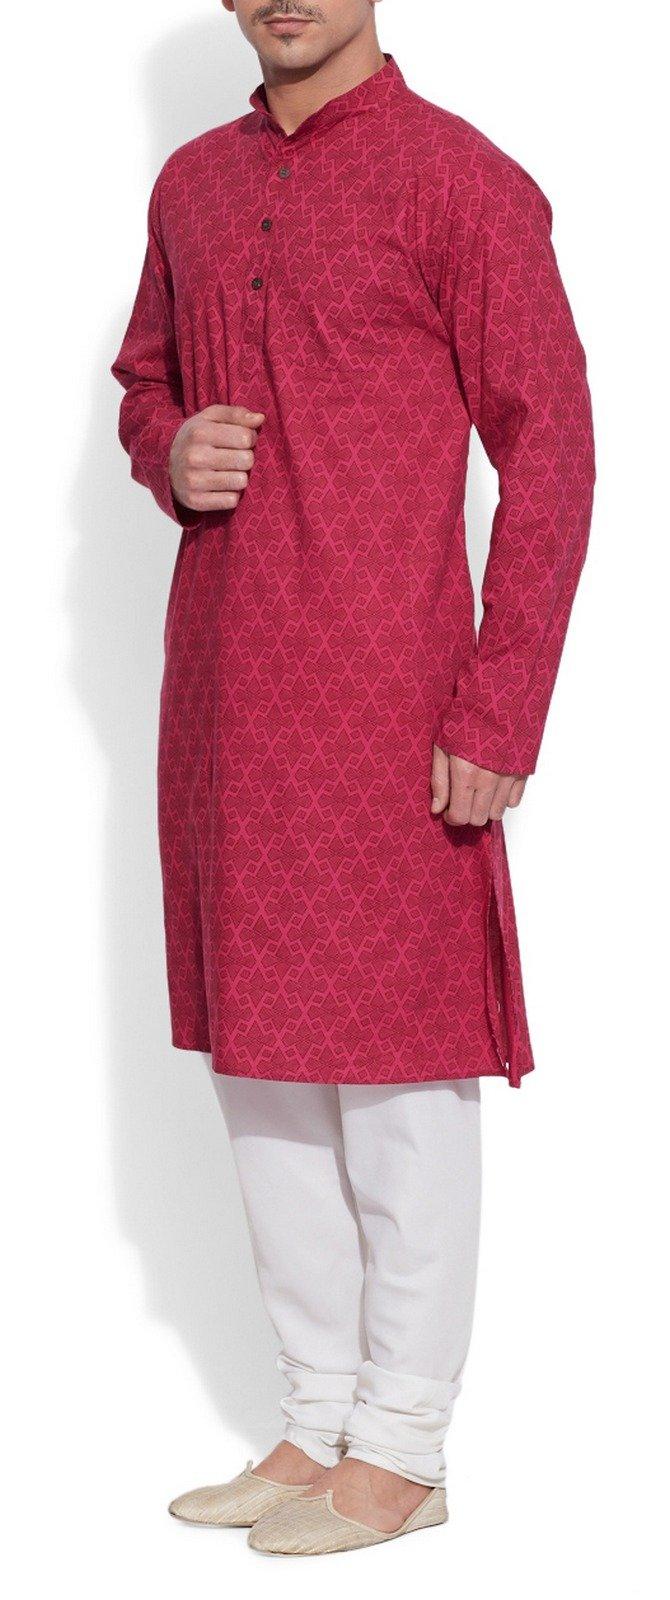 ShalinIndia Cotton Long Nehru Collar Indian Mens Kurta Shirt 3 pockets Magenta 46 by ShalinIndia (Image #5)